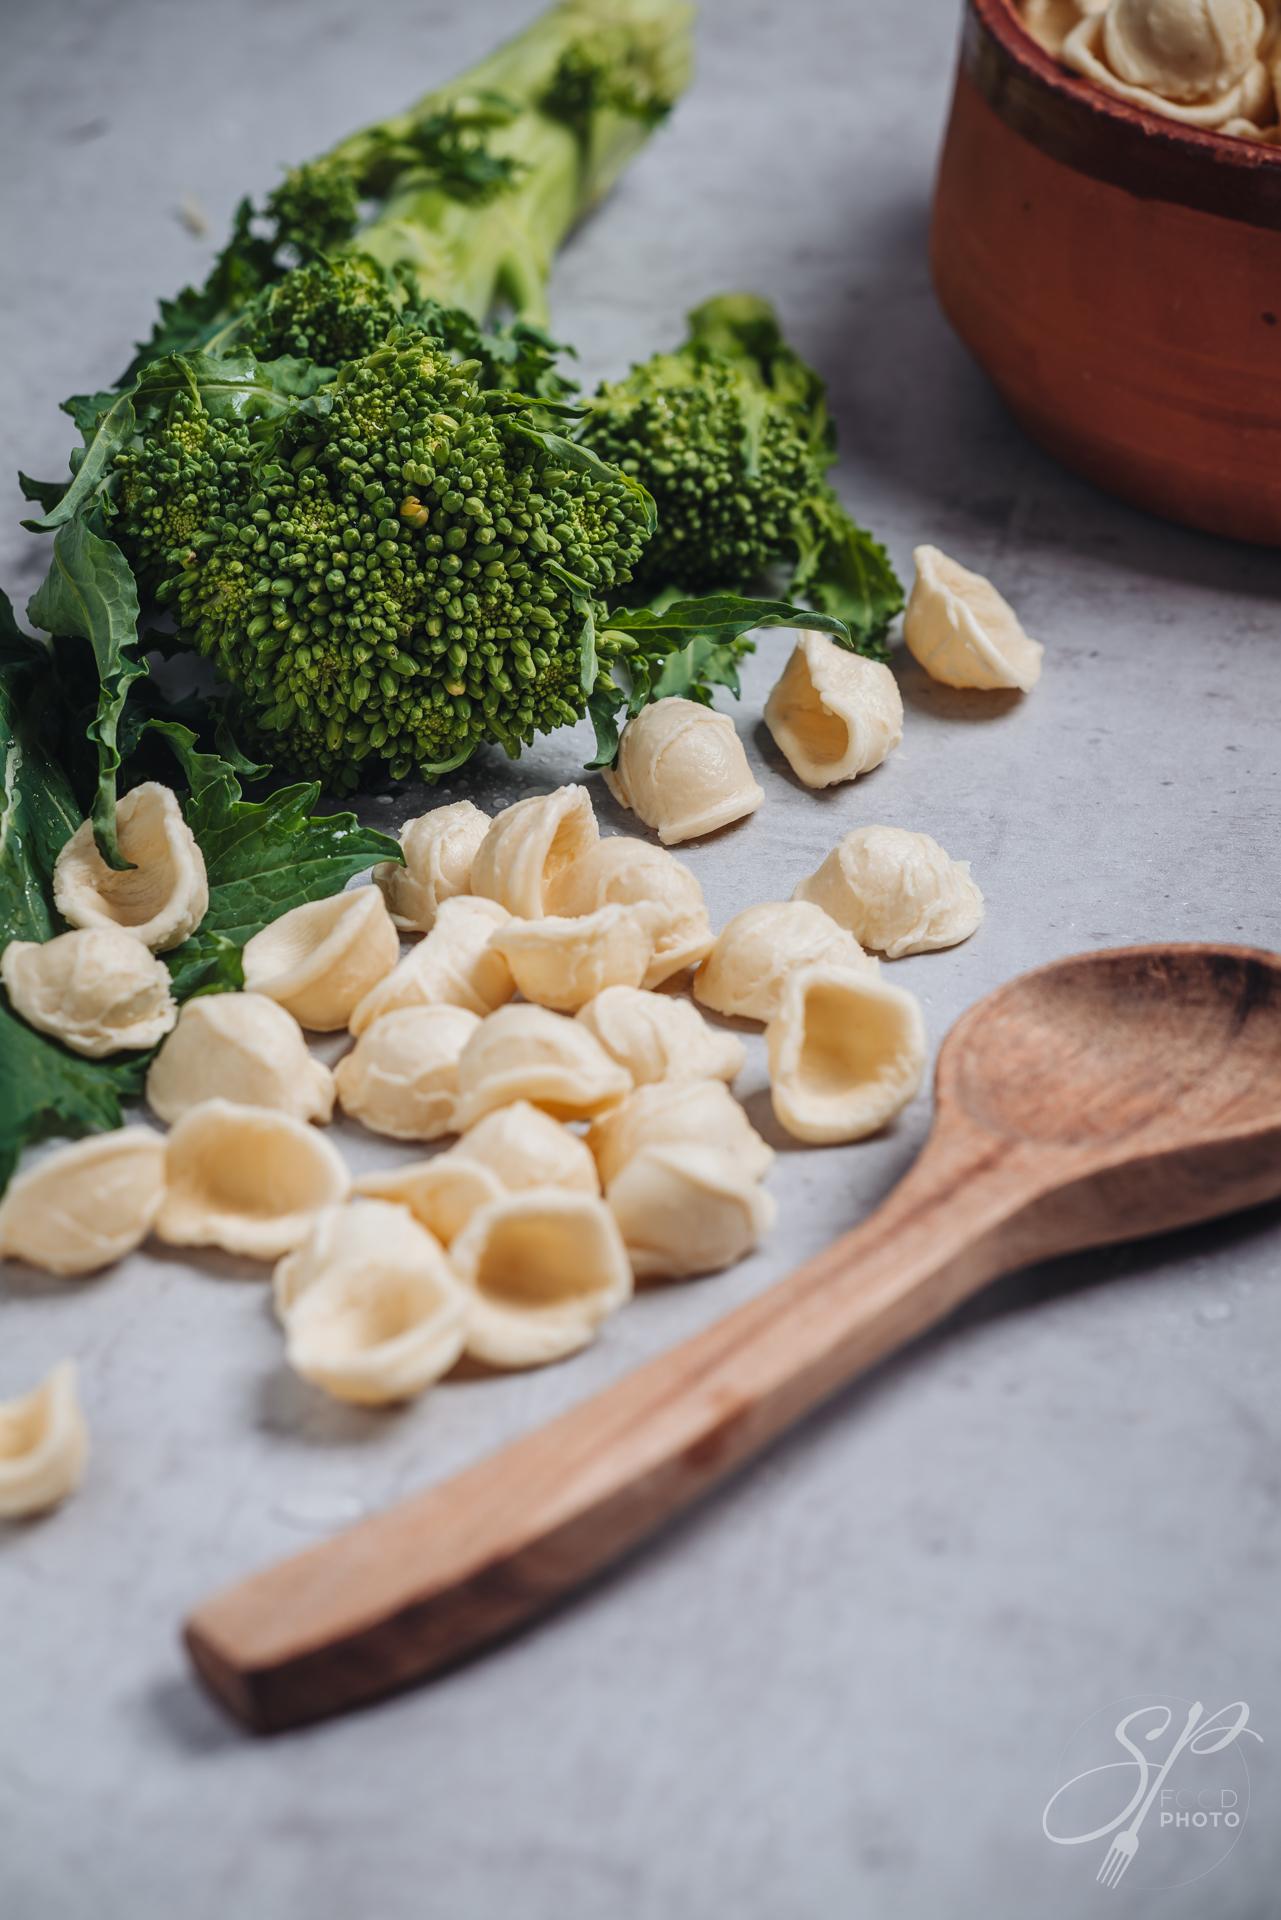 Orecchiette pasta with turnip tops